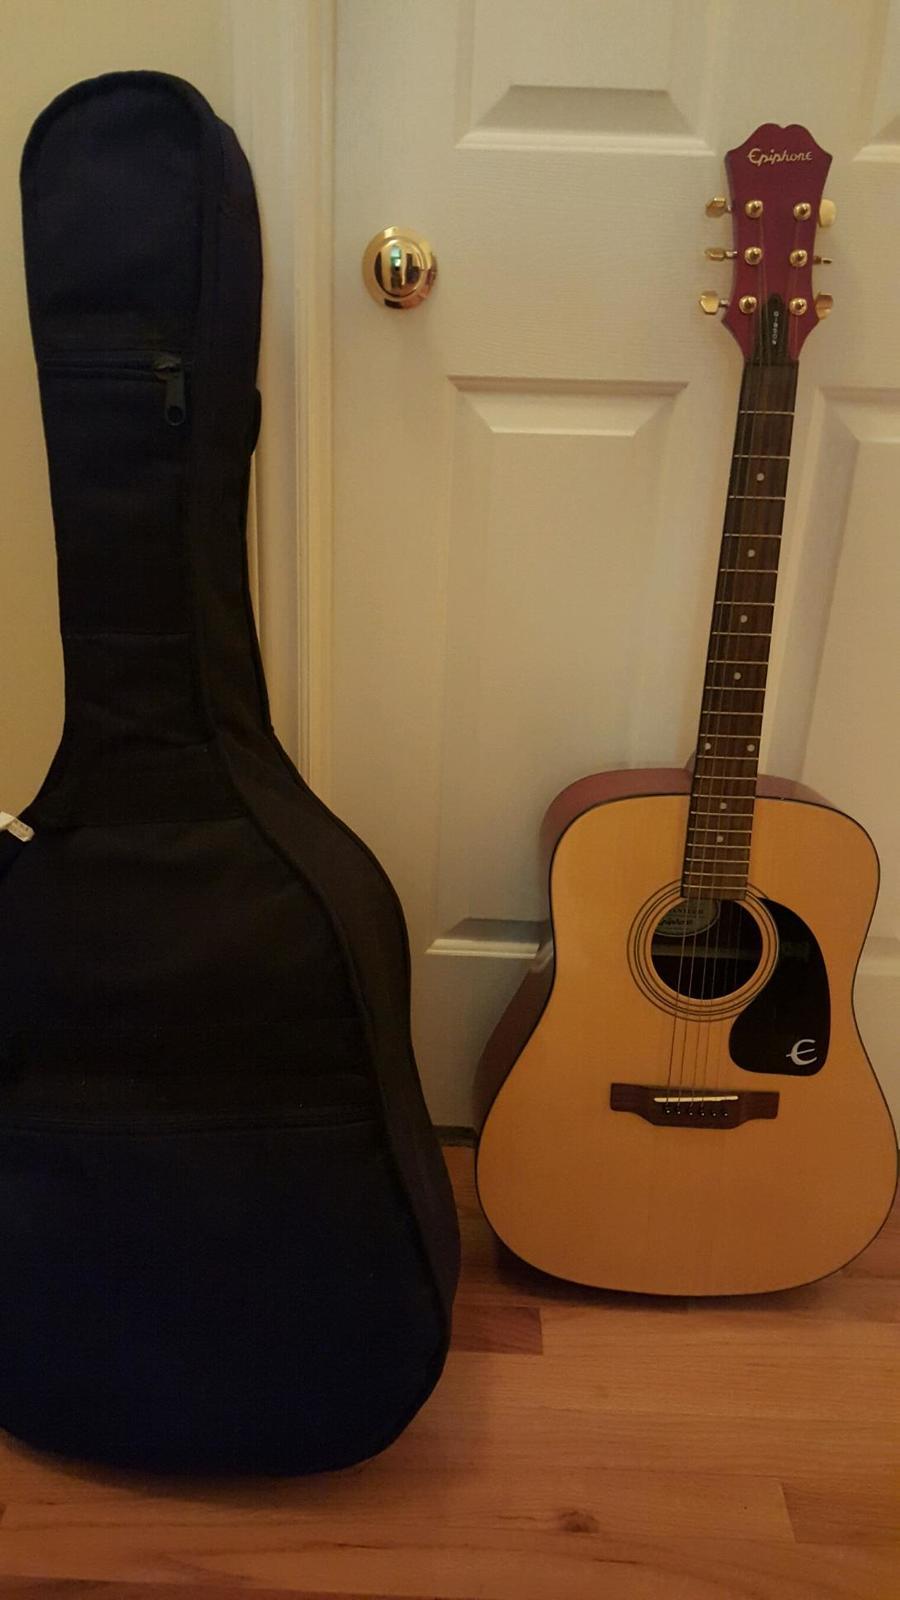 gibson epiphone model pr 200d na my guitar buddies. Black Bedroom Furniture Sets. Home Design Ideas